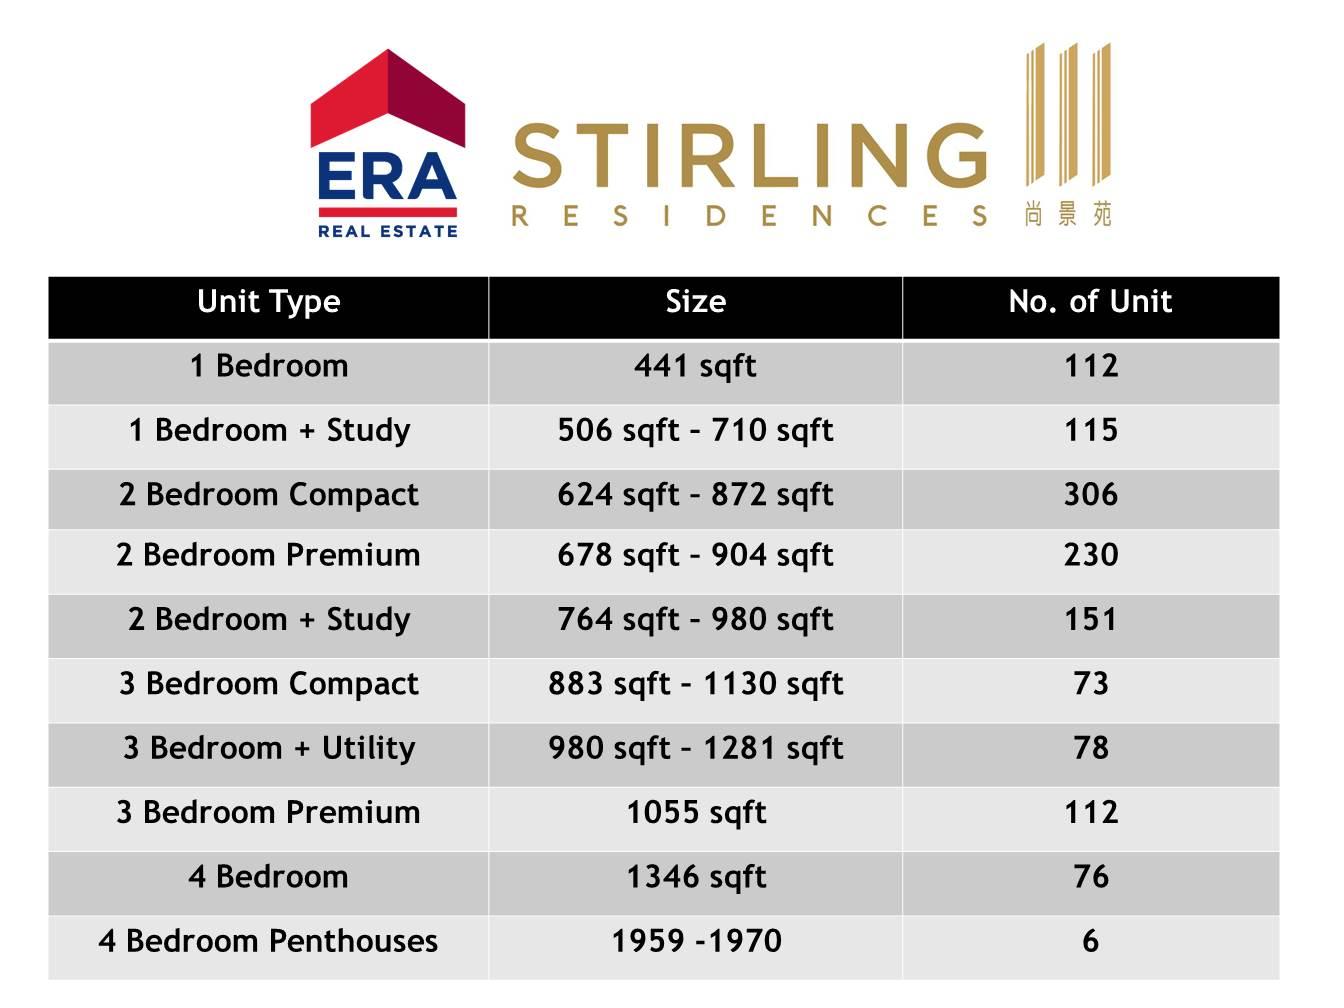 Stirling Residences image